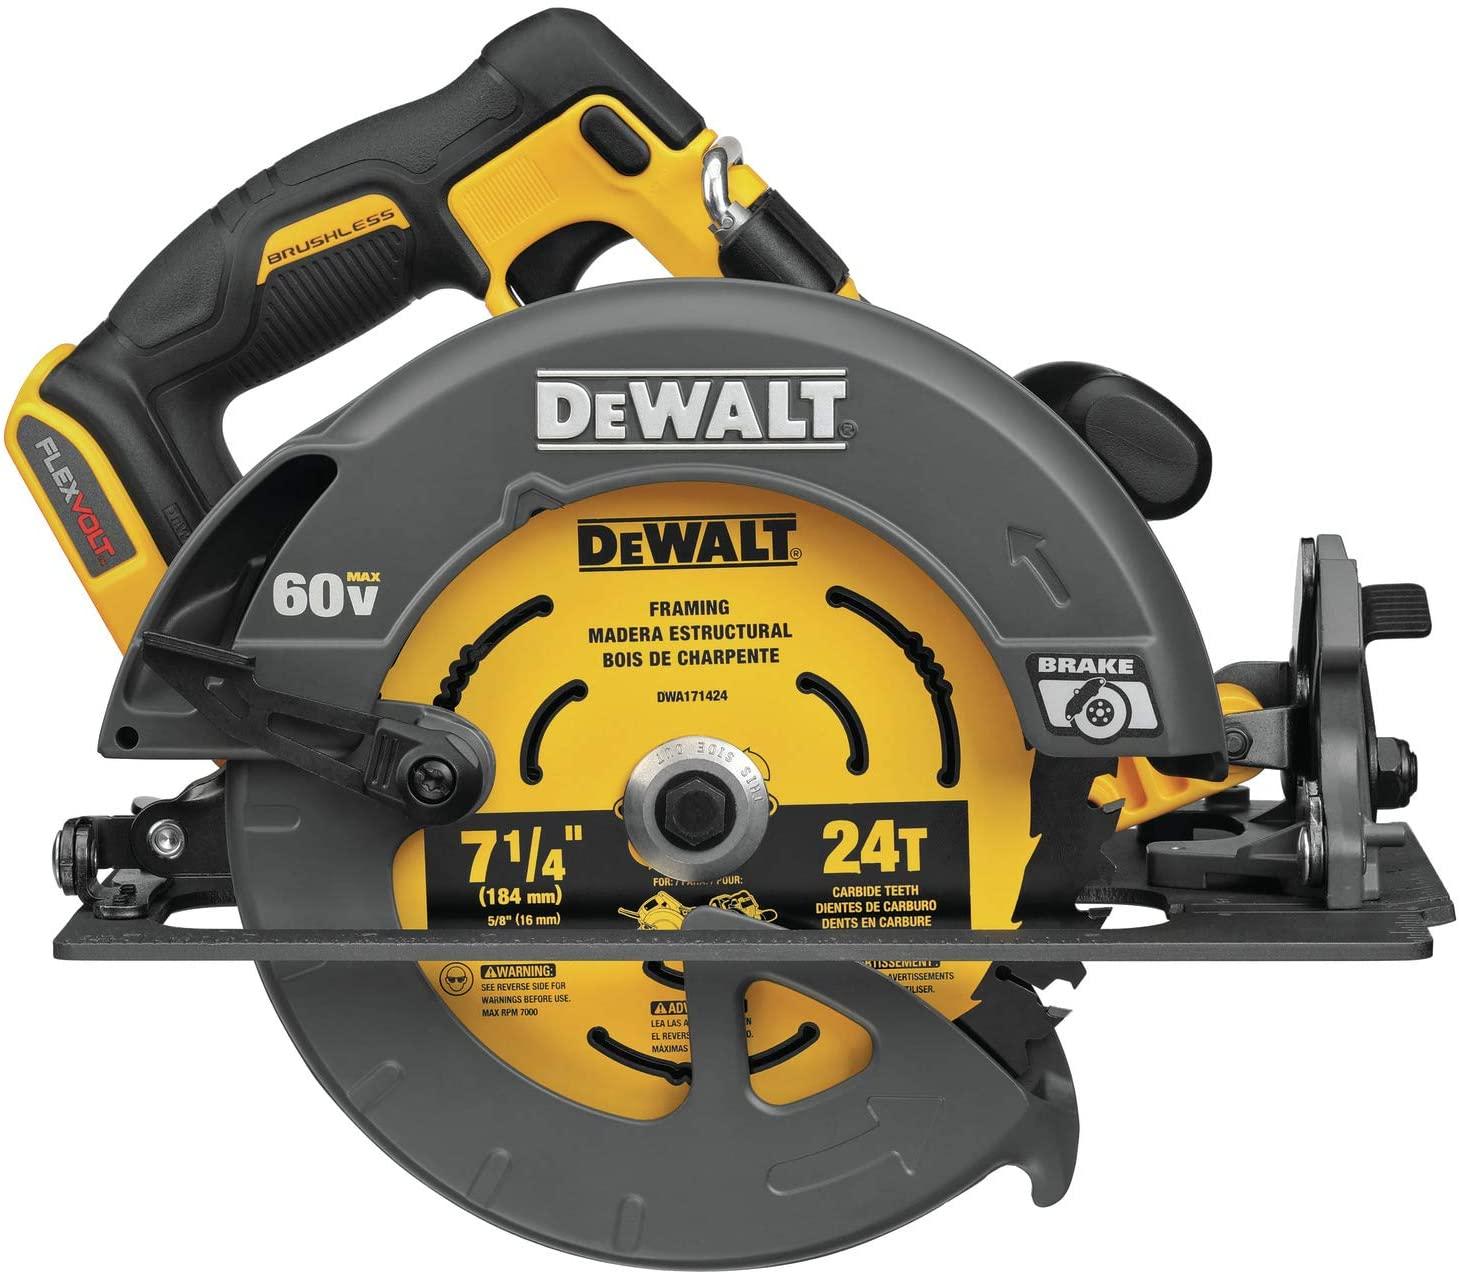 Dewalt DCS578B Flexvolt 60V MAX Brushless 7-1/4 In. Cordless Circular Saw With Brake (Tool Only)